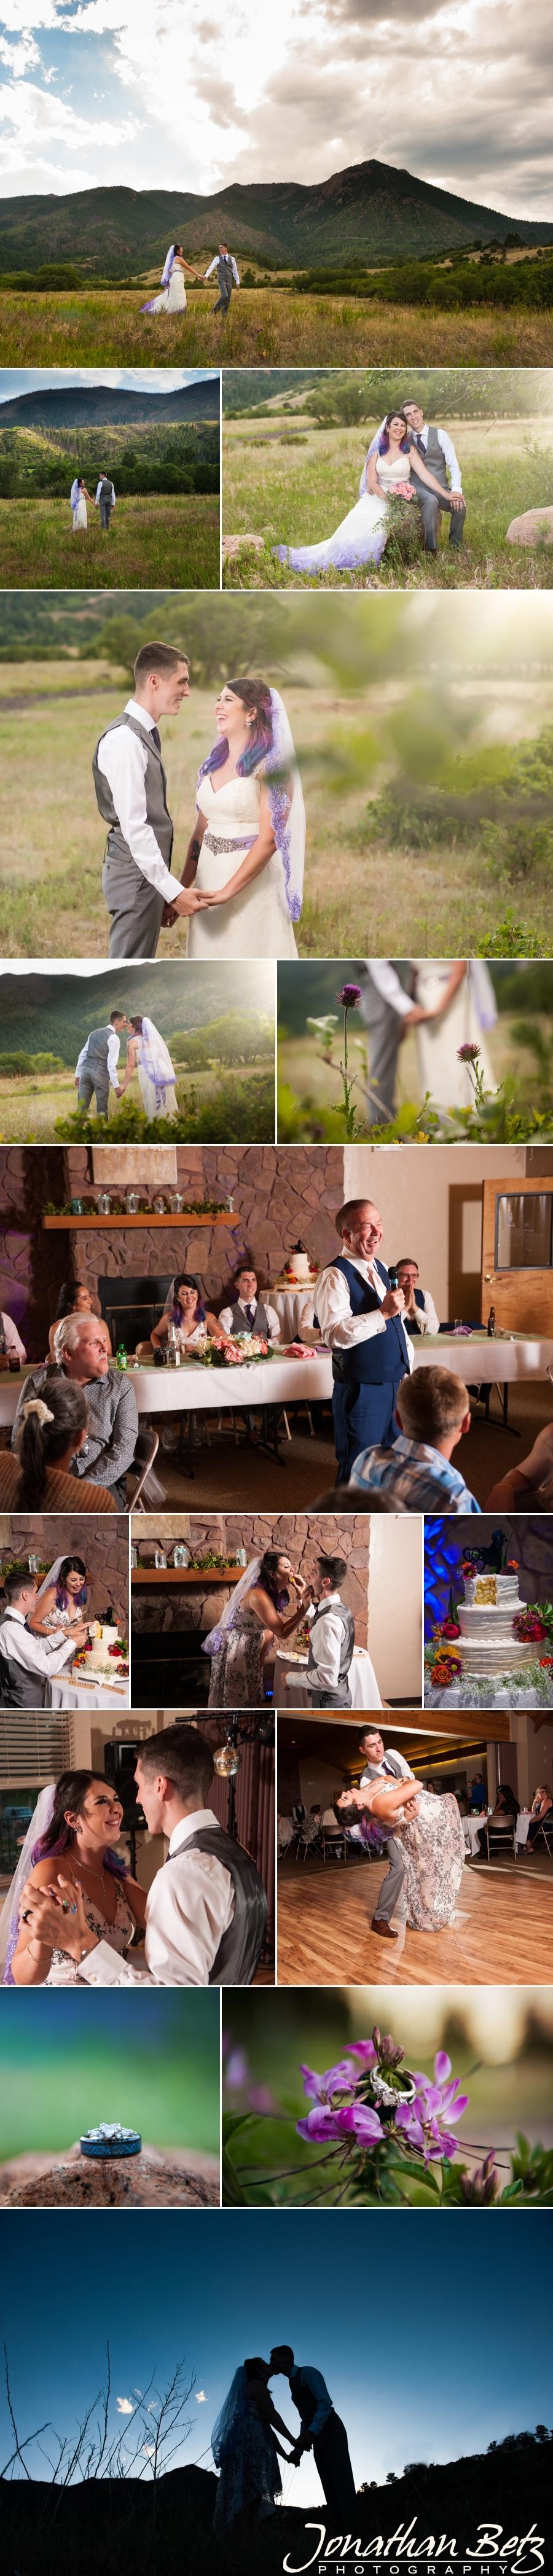 Wedding Photography Colorado Springs Jonathan Betz Professional Photographer 2